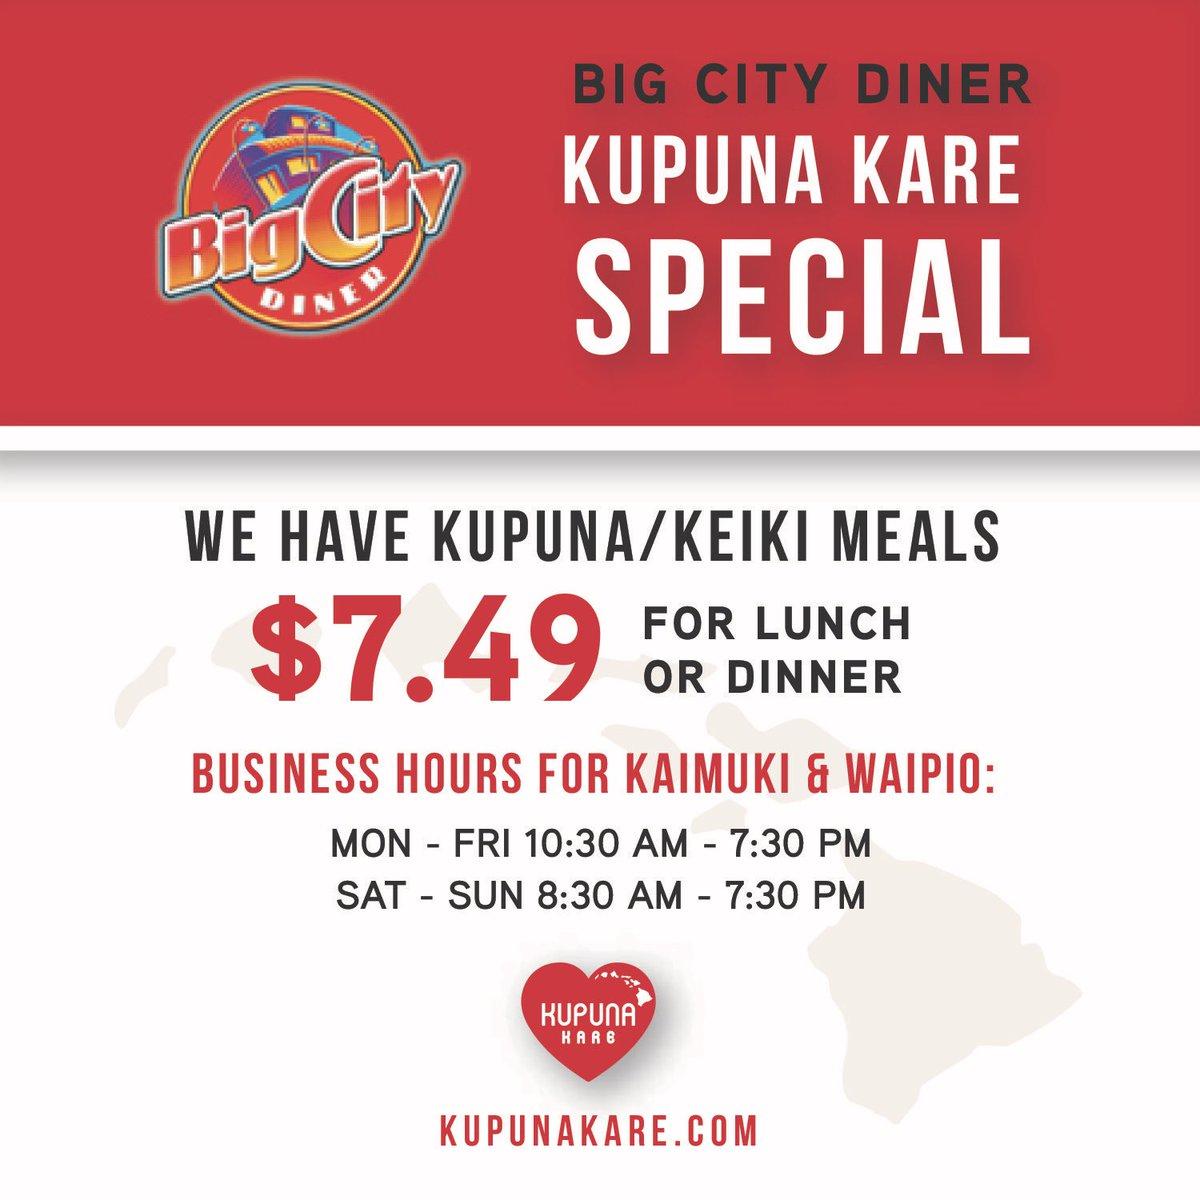 HELP FEED our KUPUNA at @BigCityDiner at @KailuaNEWS @Pearlridge @KaimukiHawaii & @WaipioCenter for #ShowAlohaChallenge #Delivery #BigCityDiner #KaimukiEATS #WaipioCenter #Kailua #Pearlridge #Brunch #Dinner #Salads #Fresh #Homemade #Burger #LocoMoco #Food https://t.co/oLmfdJGIde